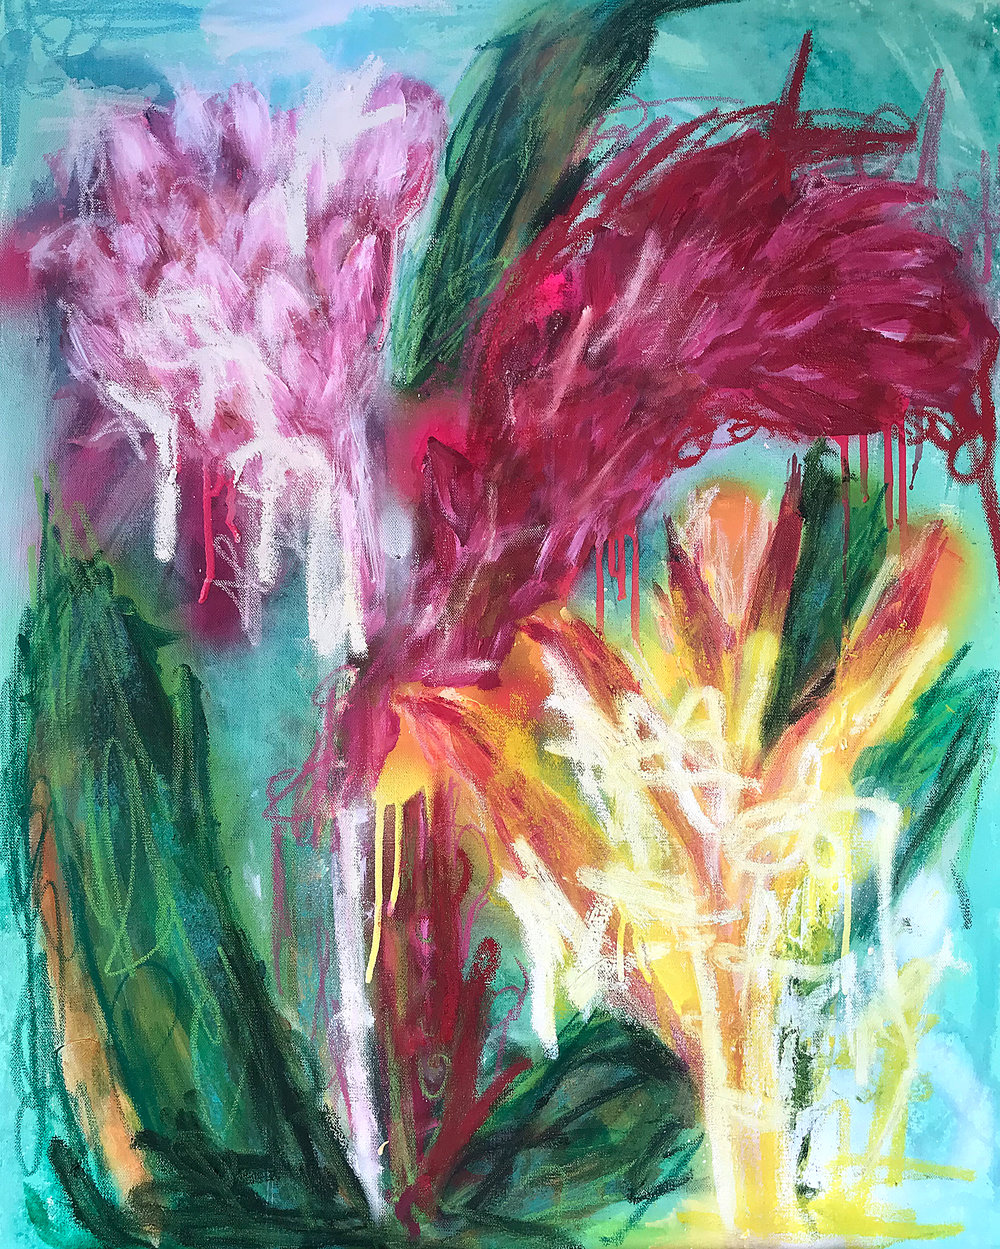 24x30 - Tropical 3 - Mix Media on Canvas